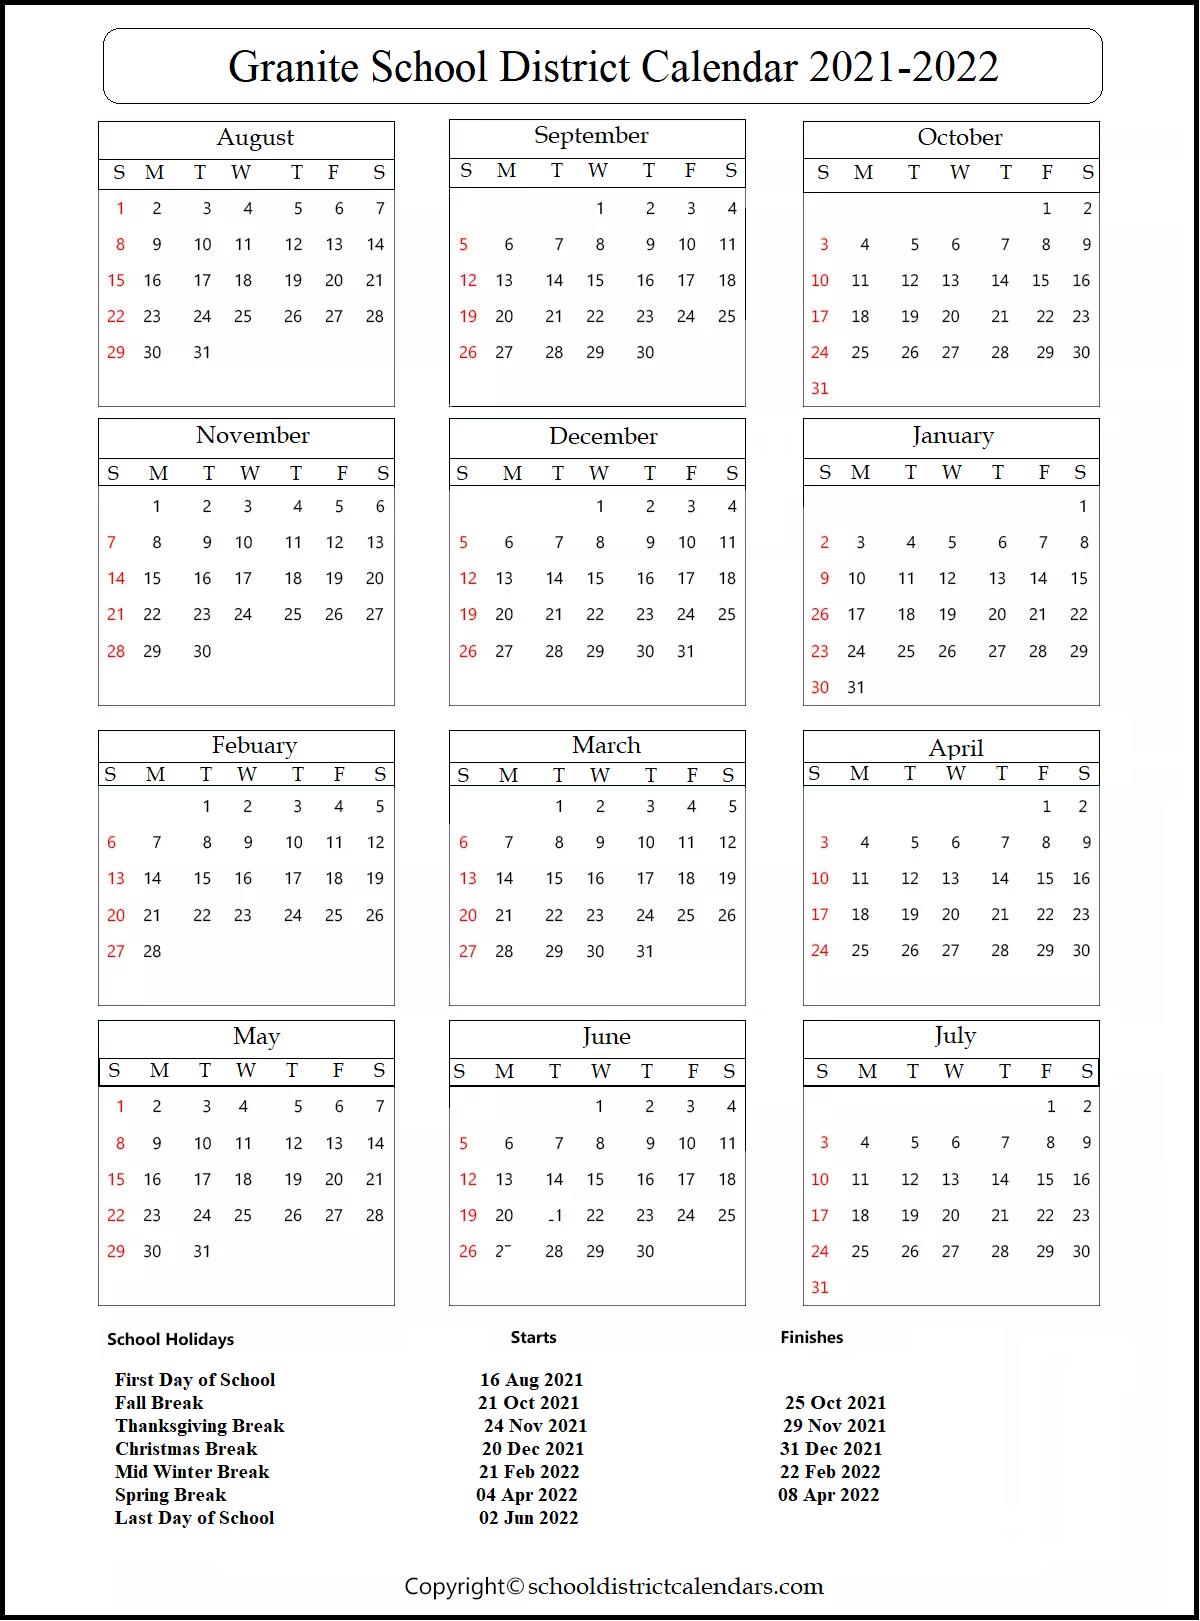 Granite School District Calendar 2021-2022